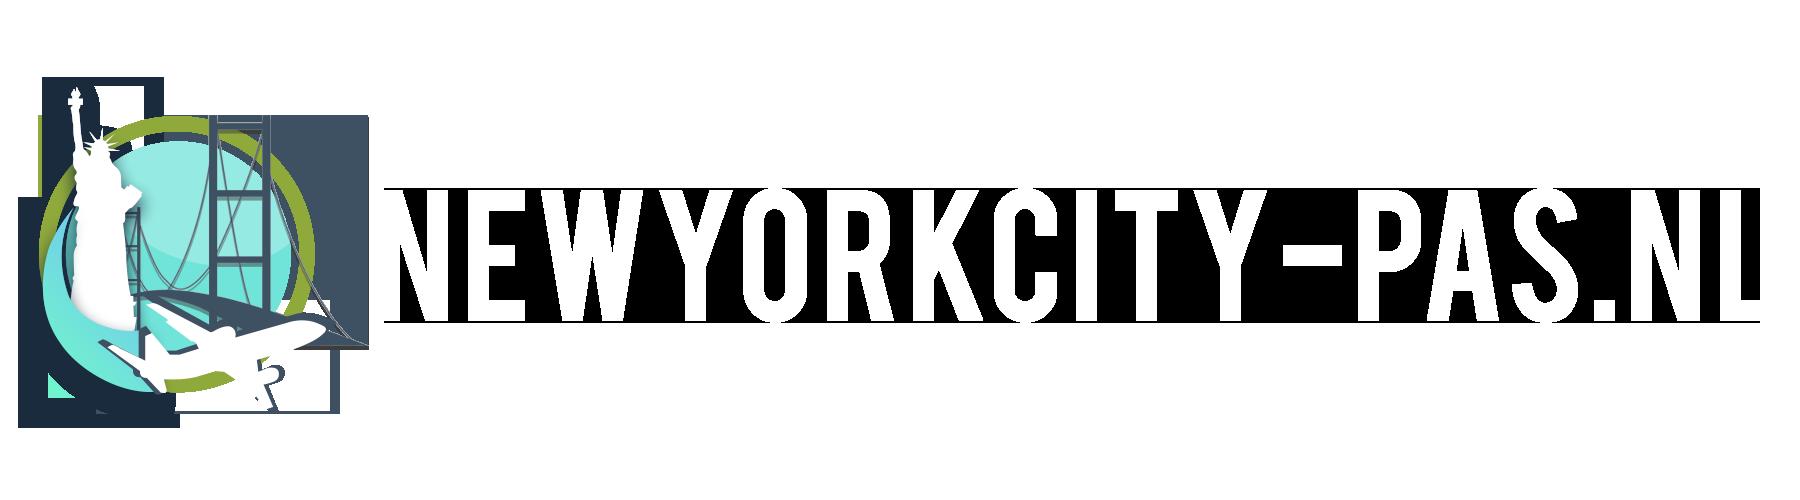 NewYorkCityPas